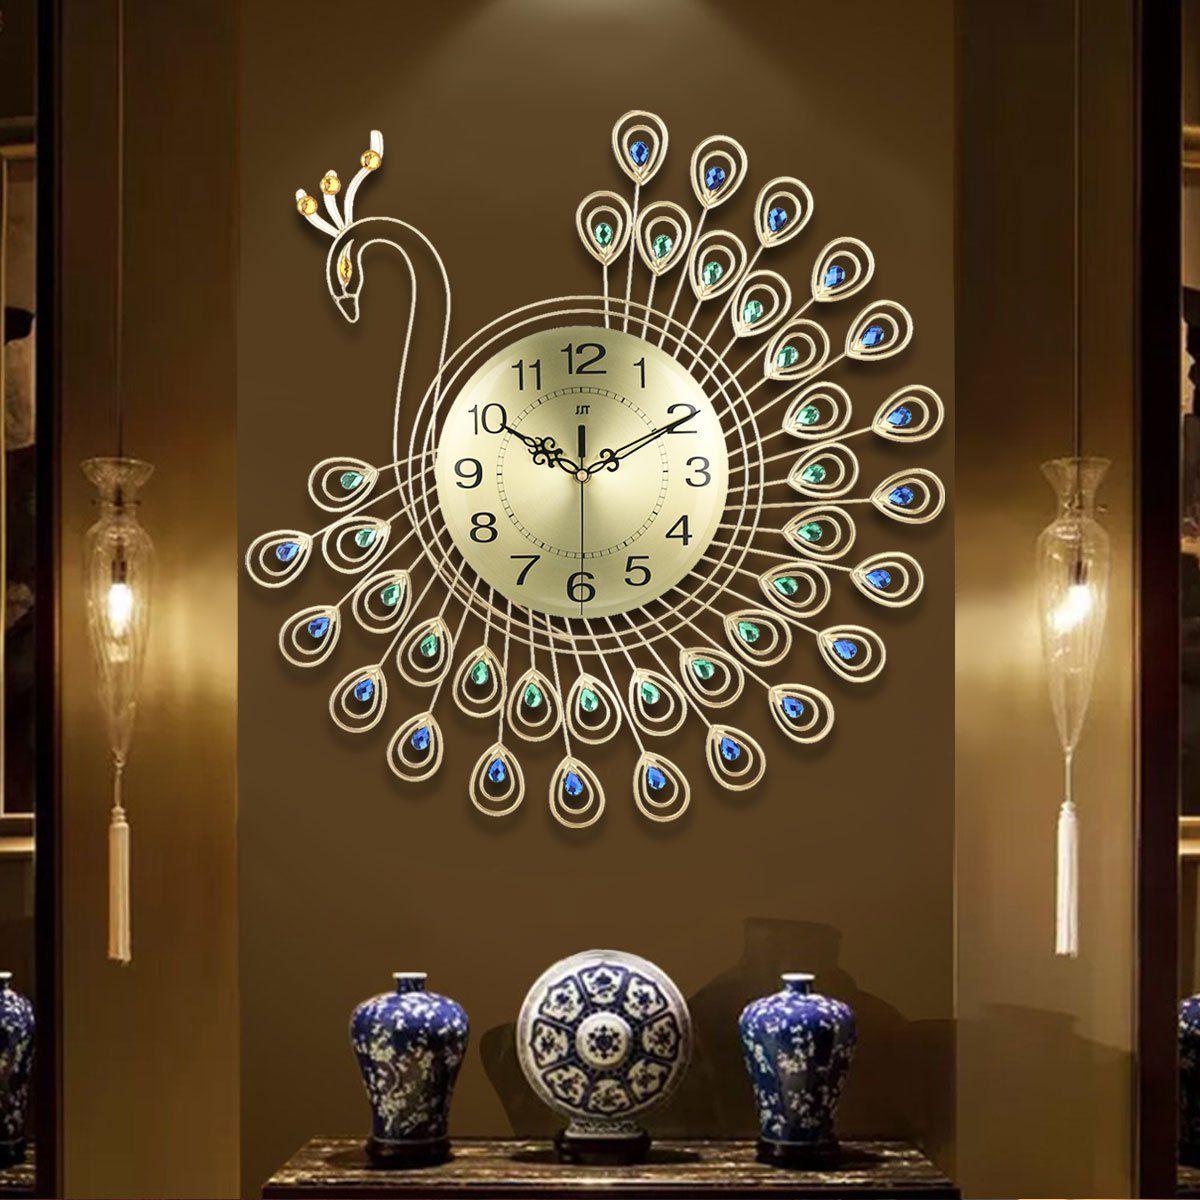 21 Inch 3d Luxury 40pcs Diamonds Peacock Decorative Clock Metal Wall Clock Silent Home Wall Clock Decor For Living Room Bedroom Office Walmart Com Wall Clock Luxury Clock Wall Decor Clock Decor